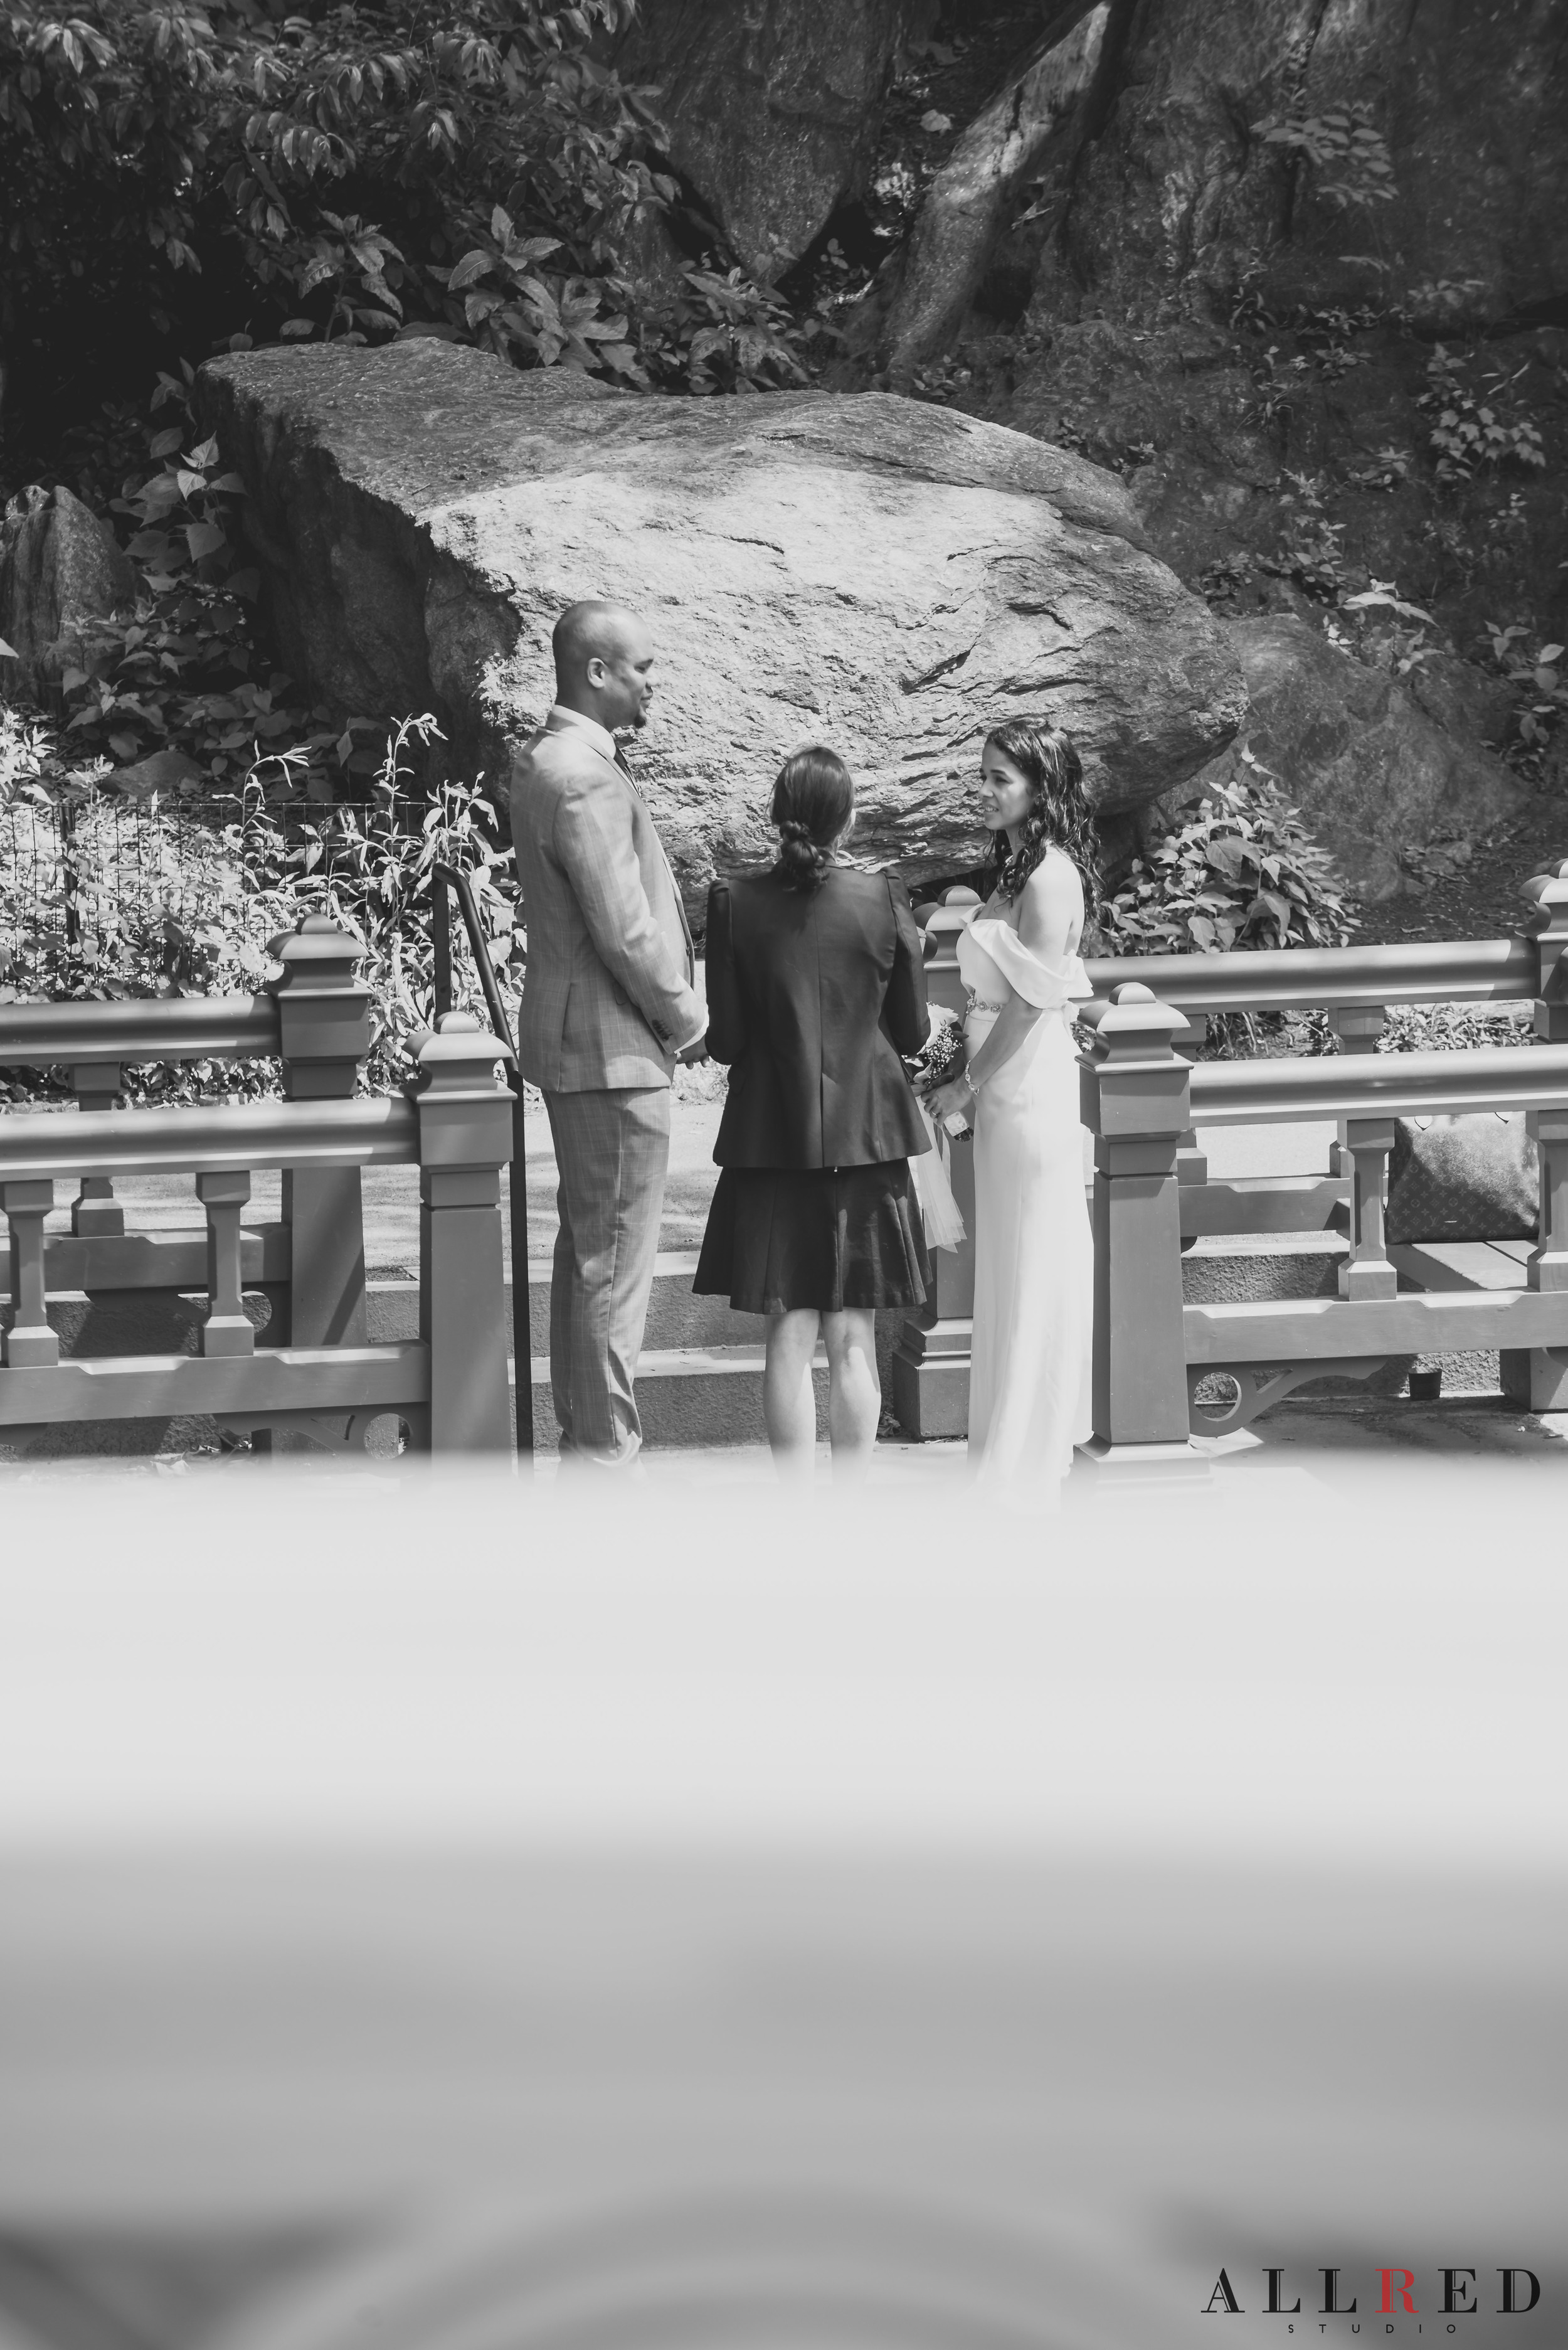 Wedding-central-park-allred-studio-new-york-photographer-new-jersey-hudson-valley-2254.jpg